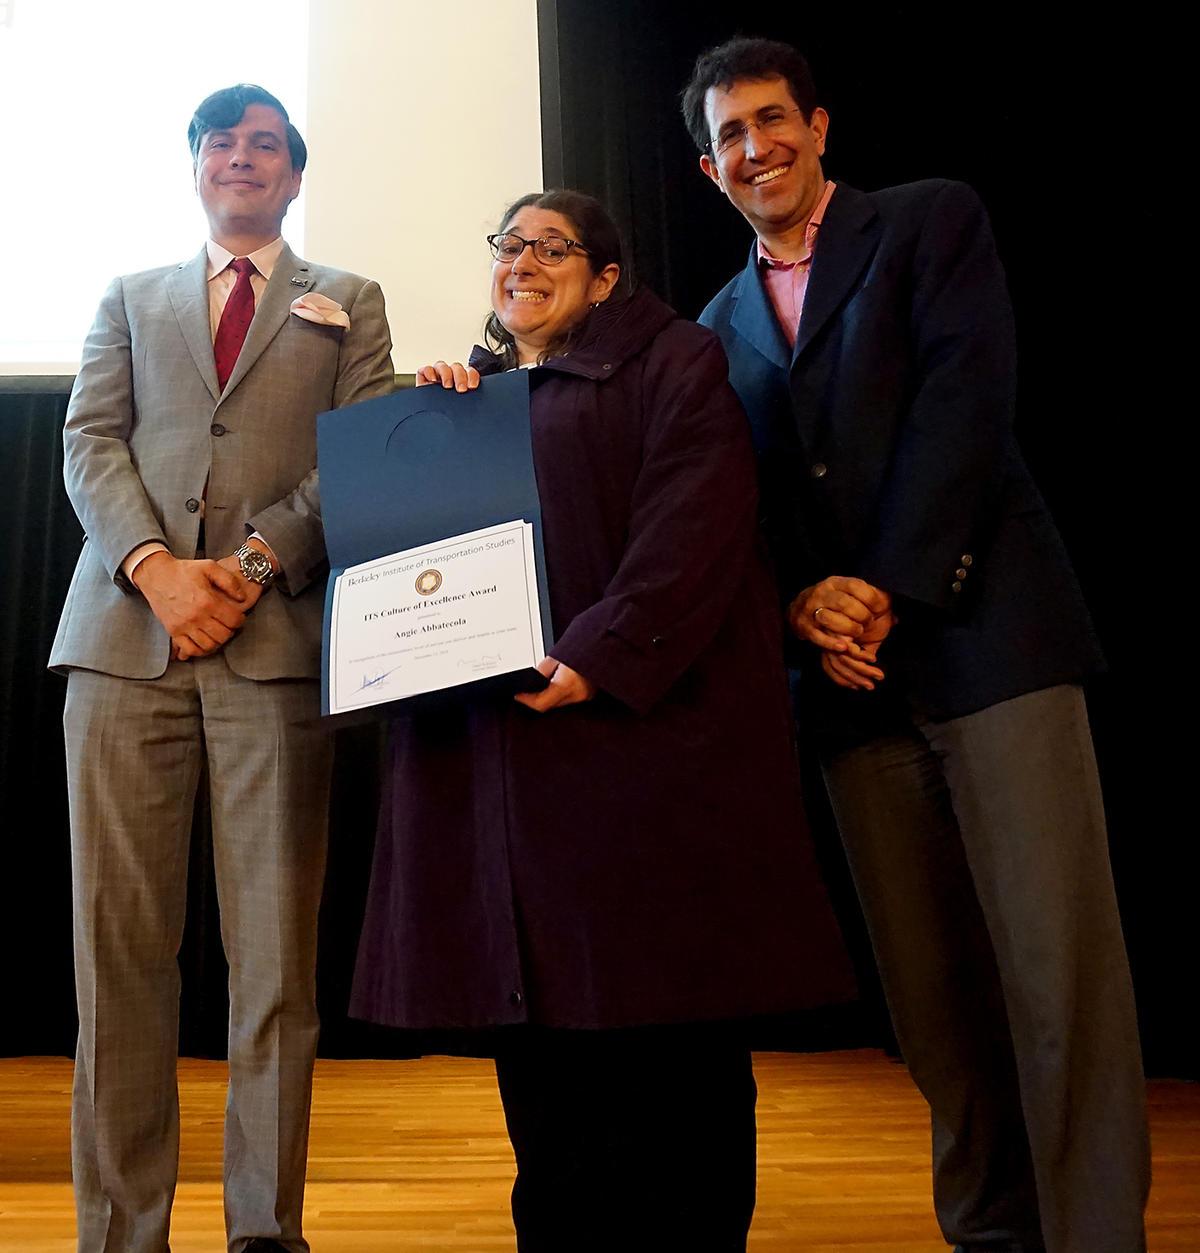 Abbaticola ITS Culture of Excellence Award